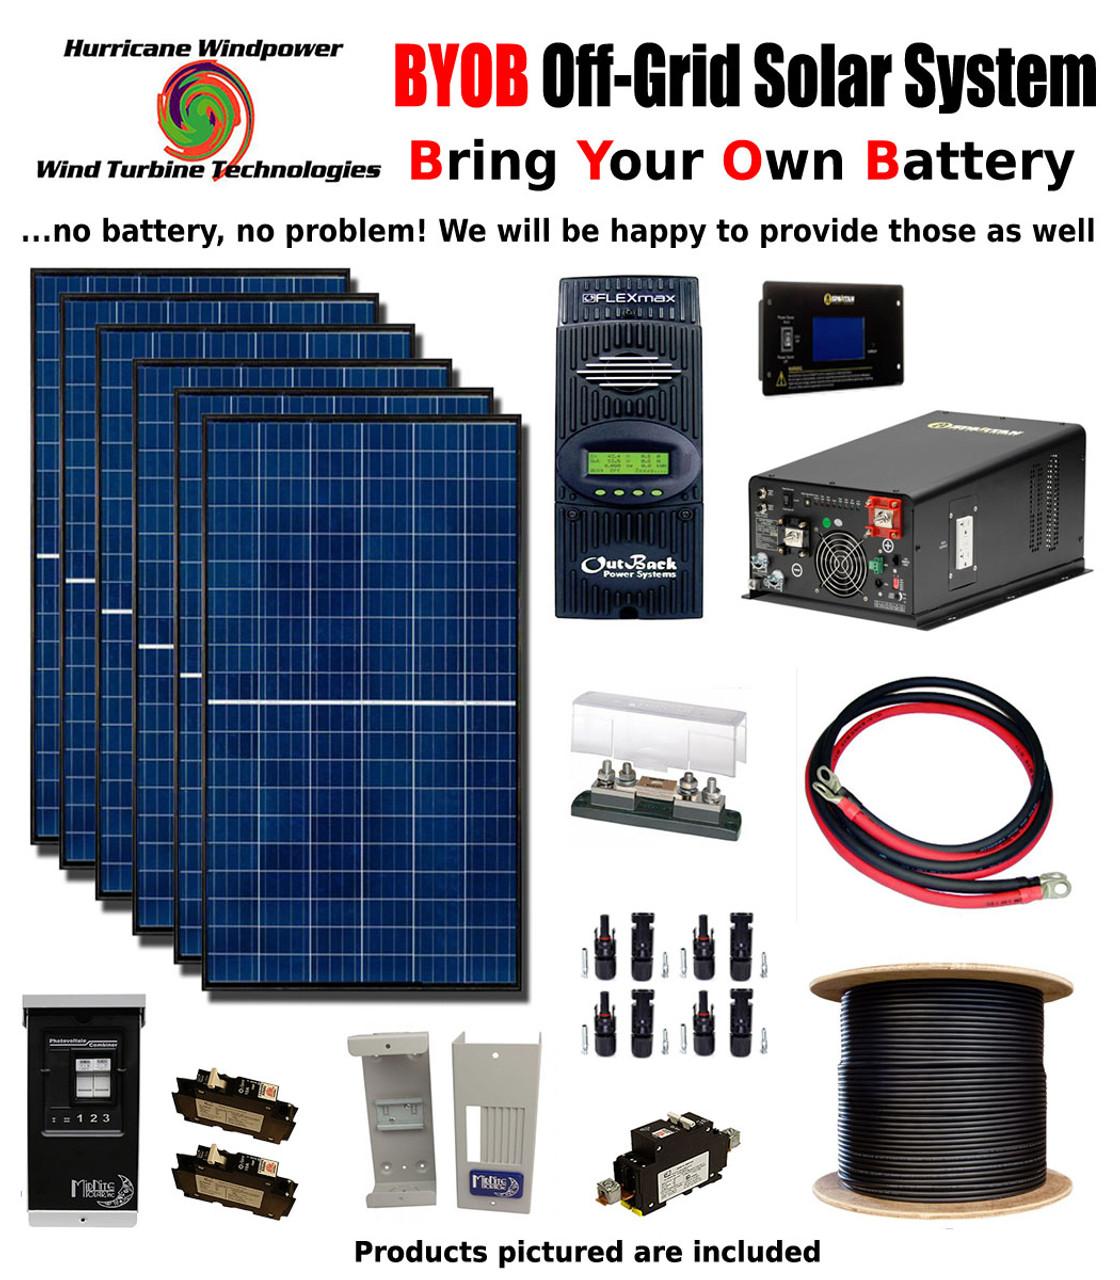 hight resolution of byob off grid 1740w 24v solar panel kit tiny house cabin pv system outback fm80